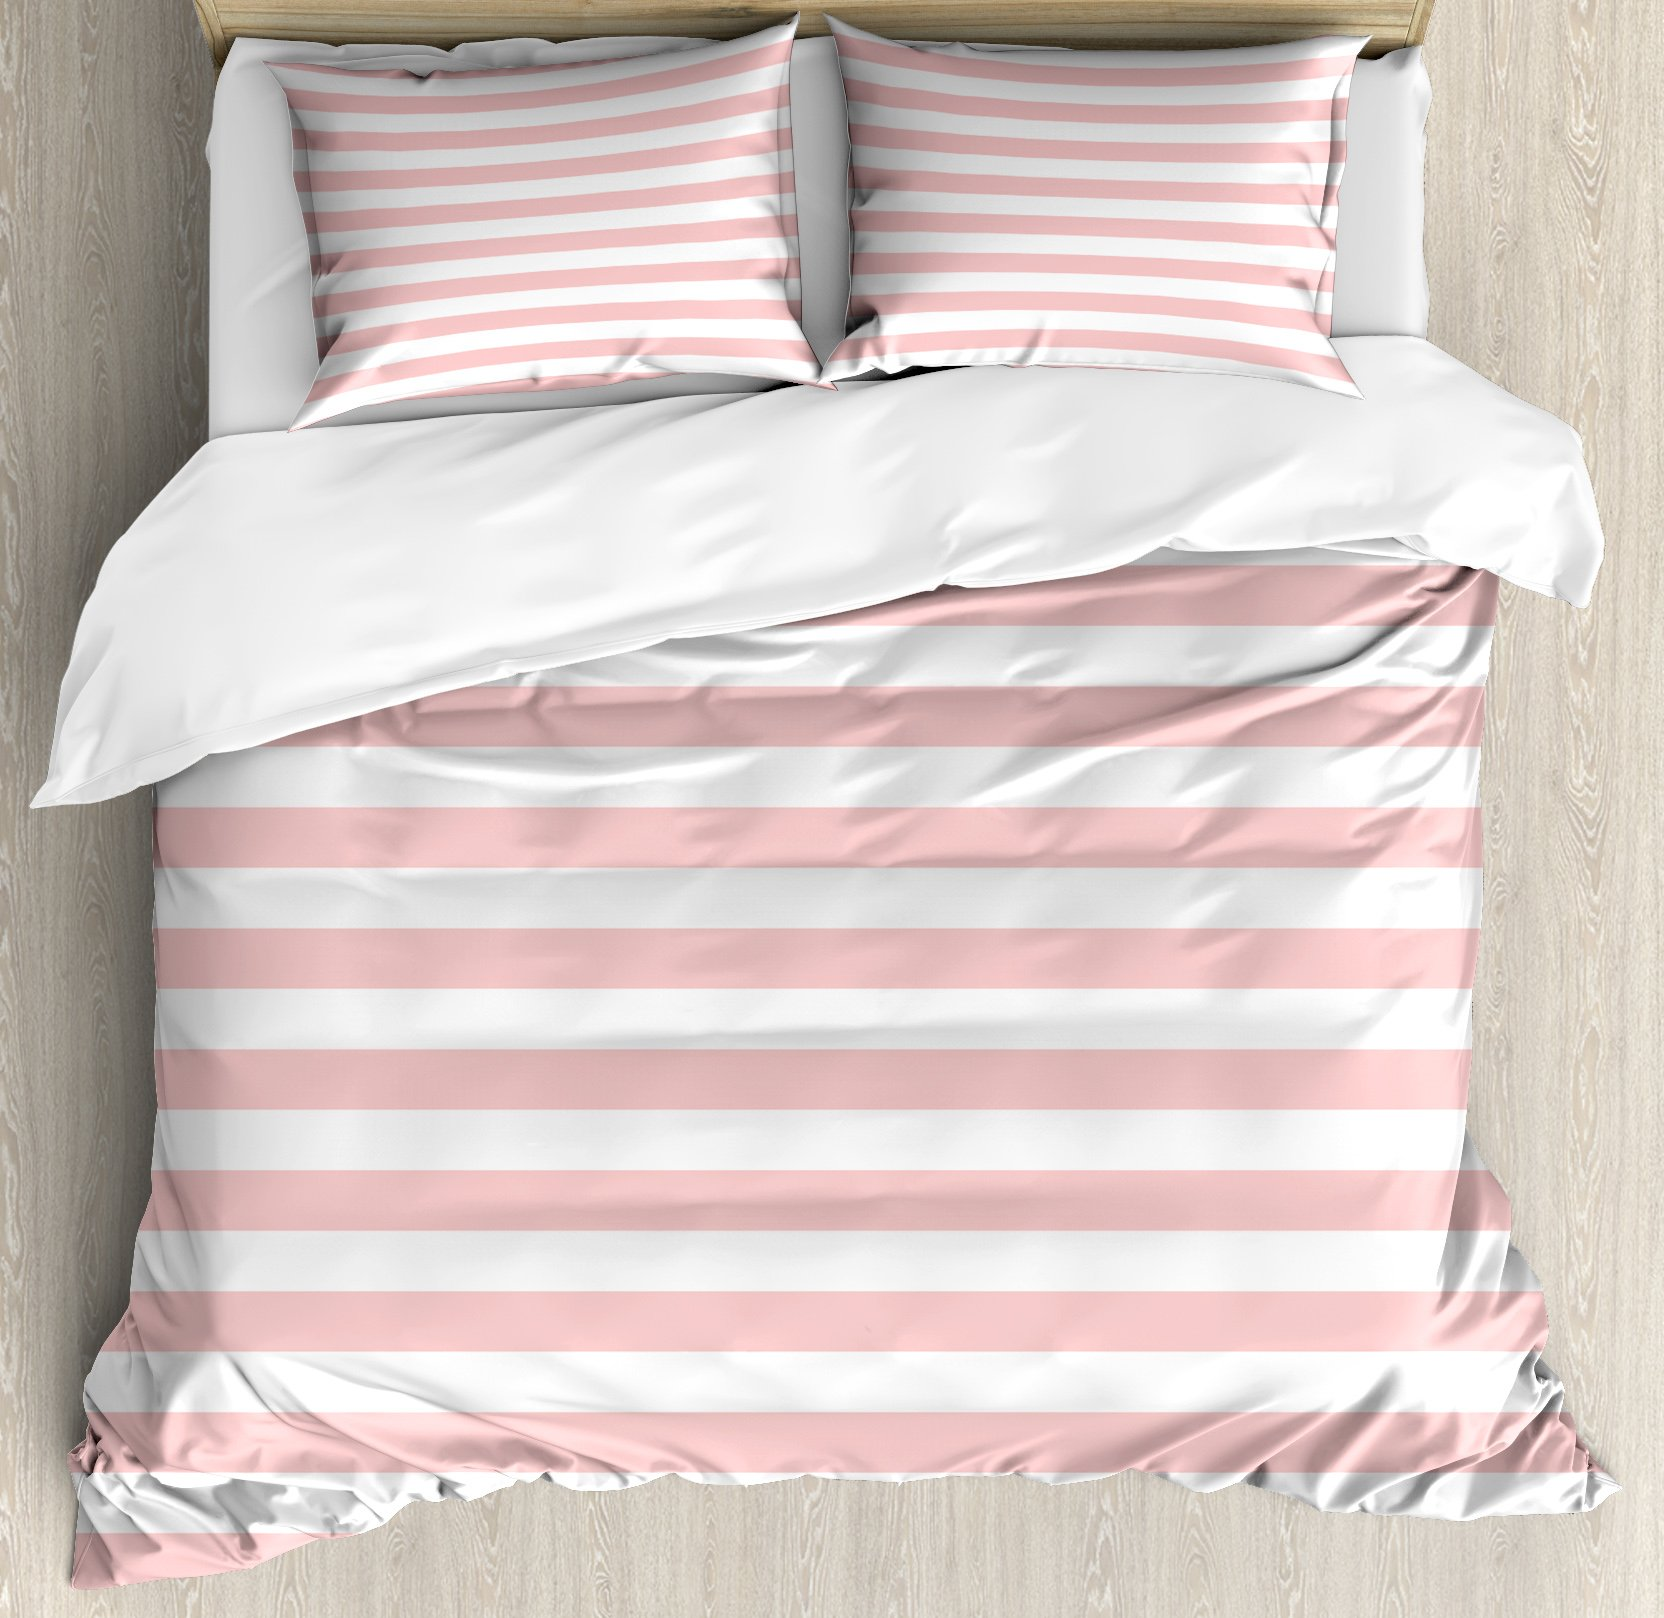 Lunarable Blush Duvet Cover Set Queen Size, Retro Style Pastel Colored Pink Stripes on White Background Vintage Geometric Design, Decorative 3 Piece Bedding Set with 2 Pillow Shams, Rose White